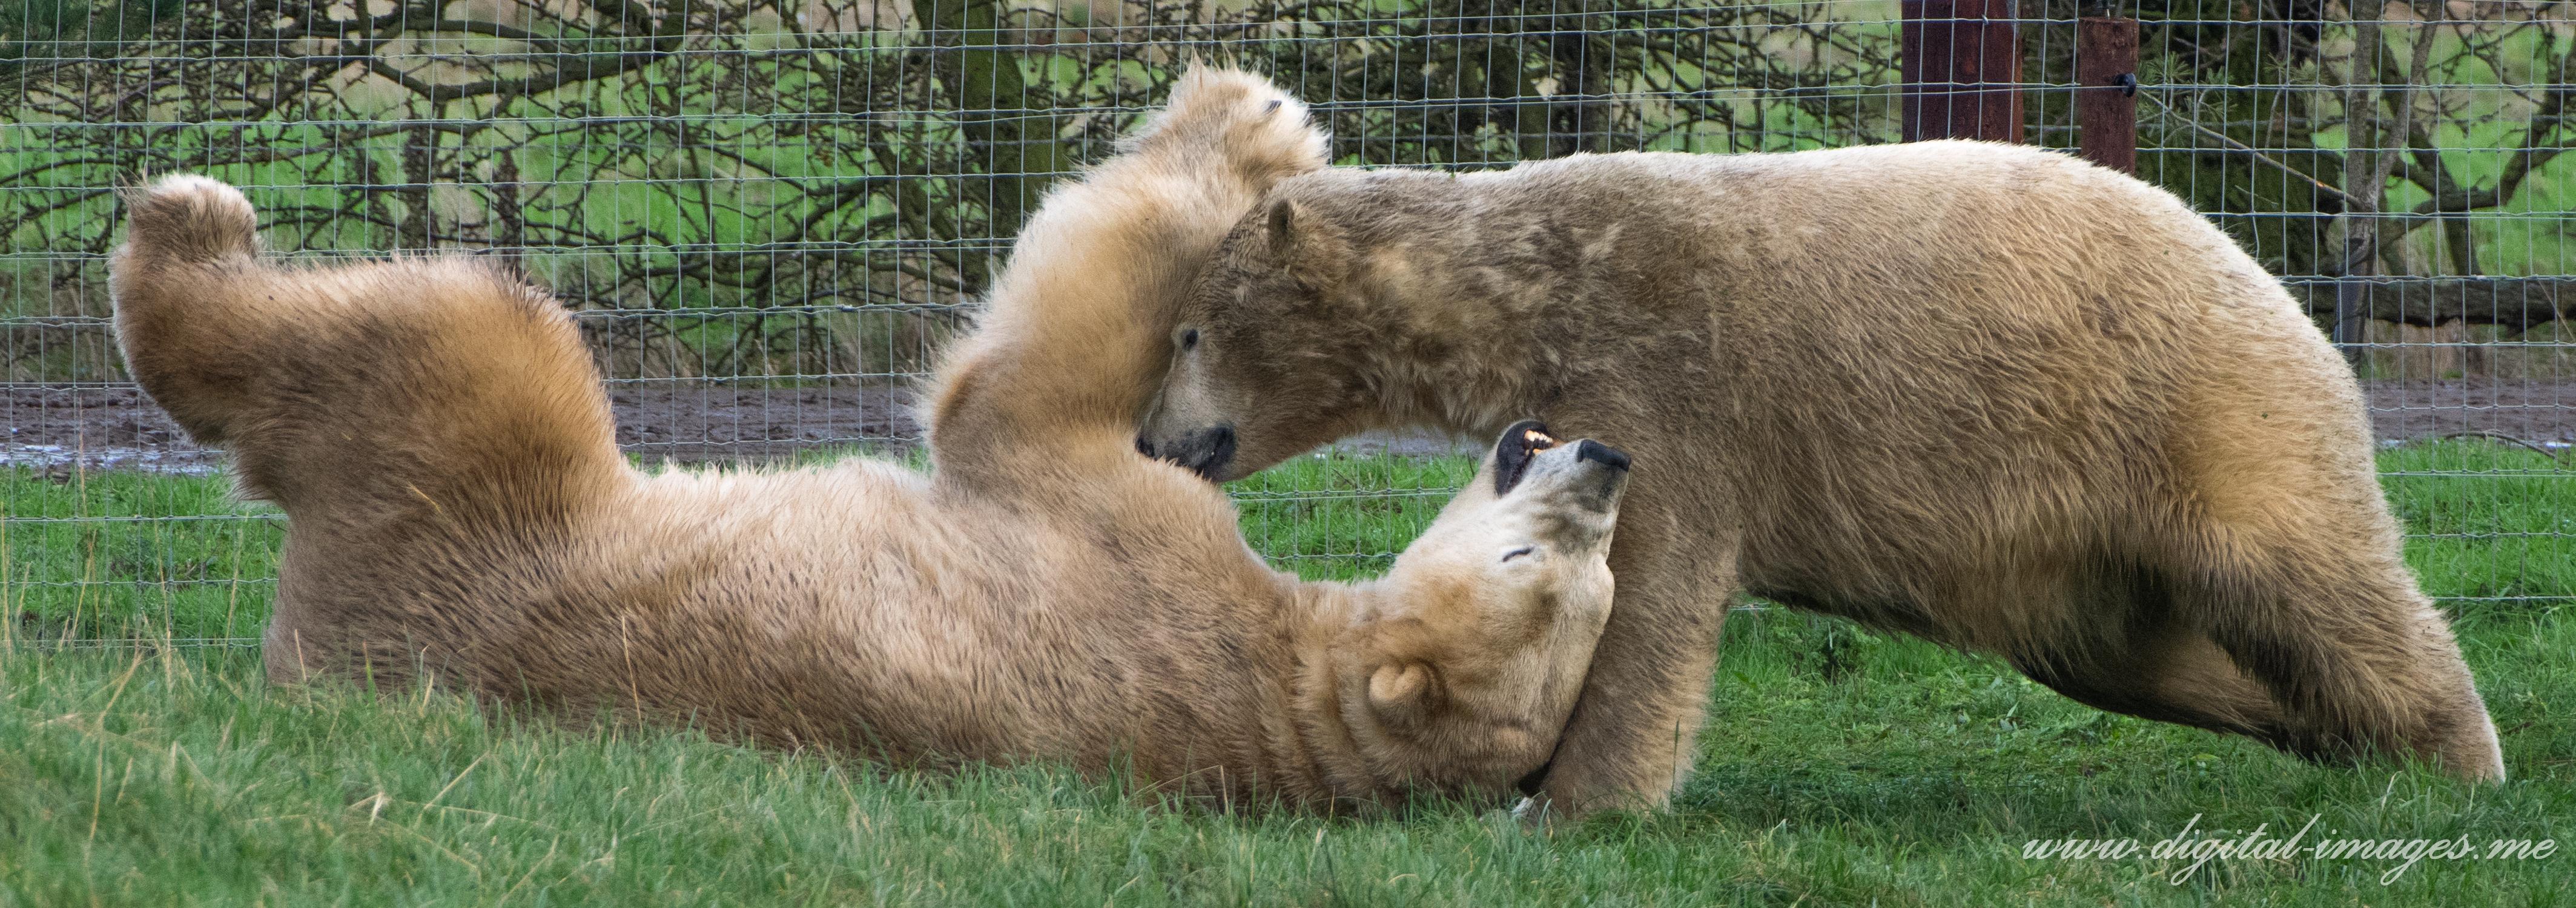 Polar Bears, Favourite Subjects of 2016